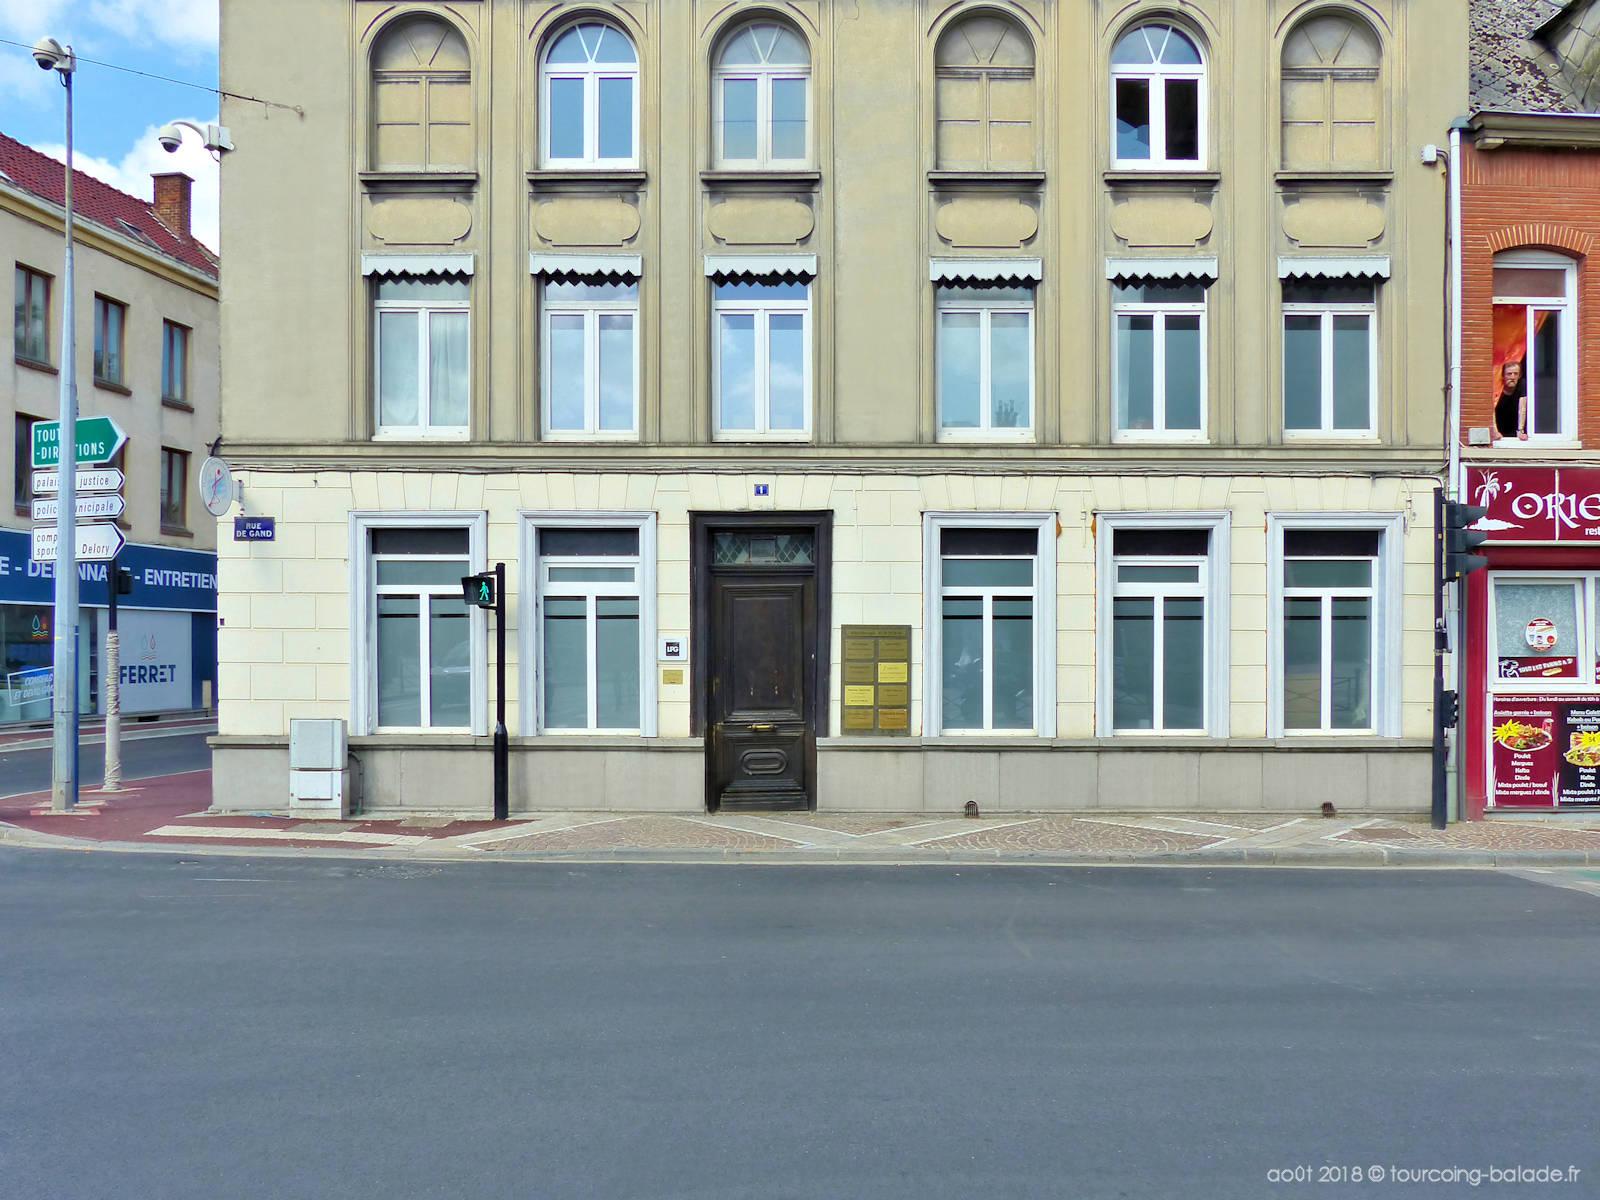 Cabinet Kinésithérapie - Rue de Gand Tourcoing